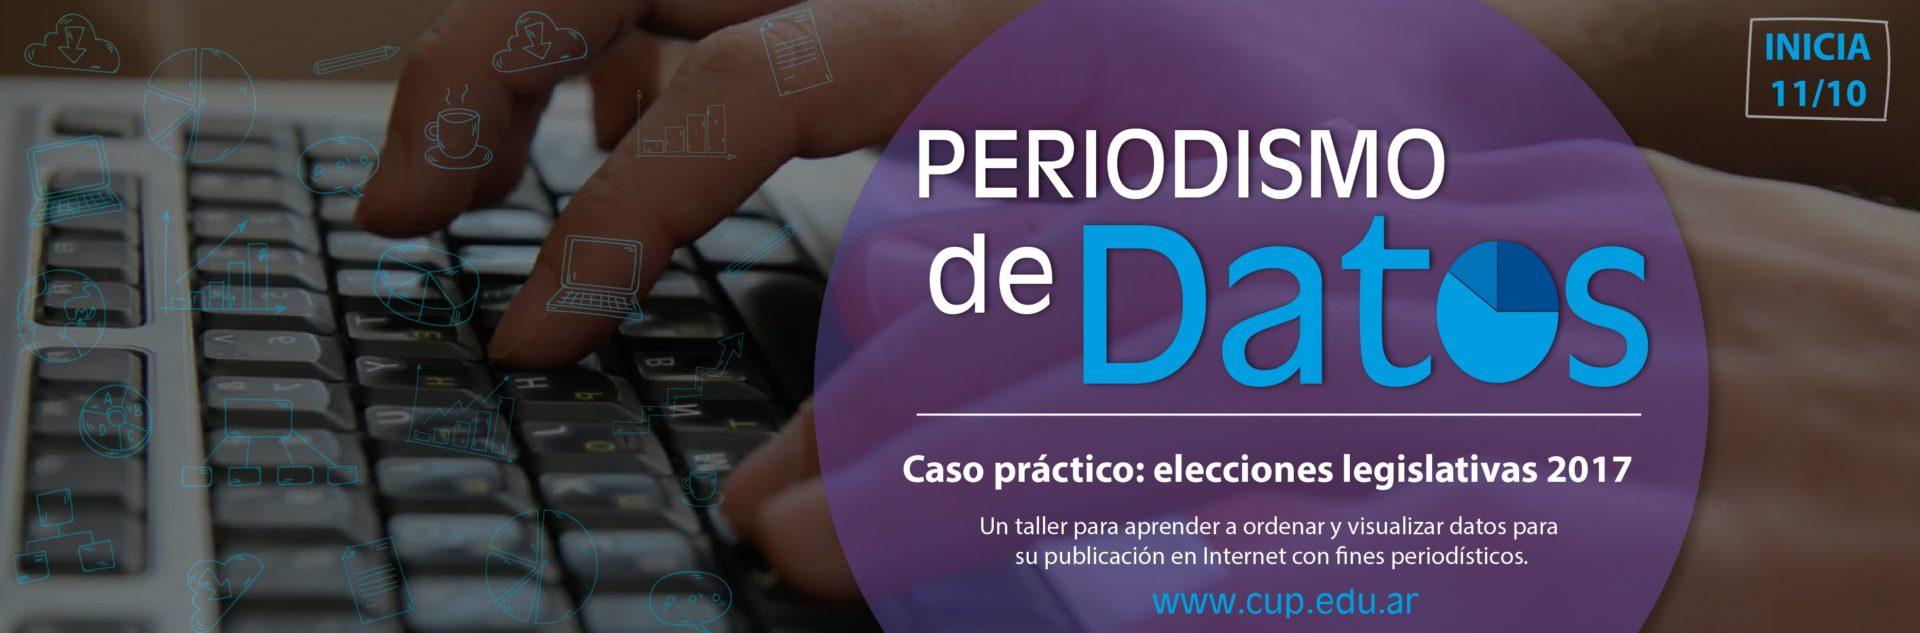 slay-web-periodismo-de-datos-01-min